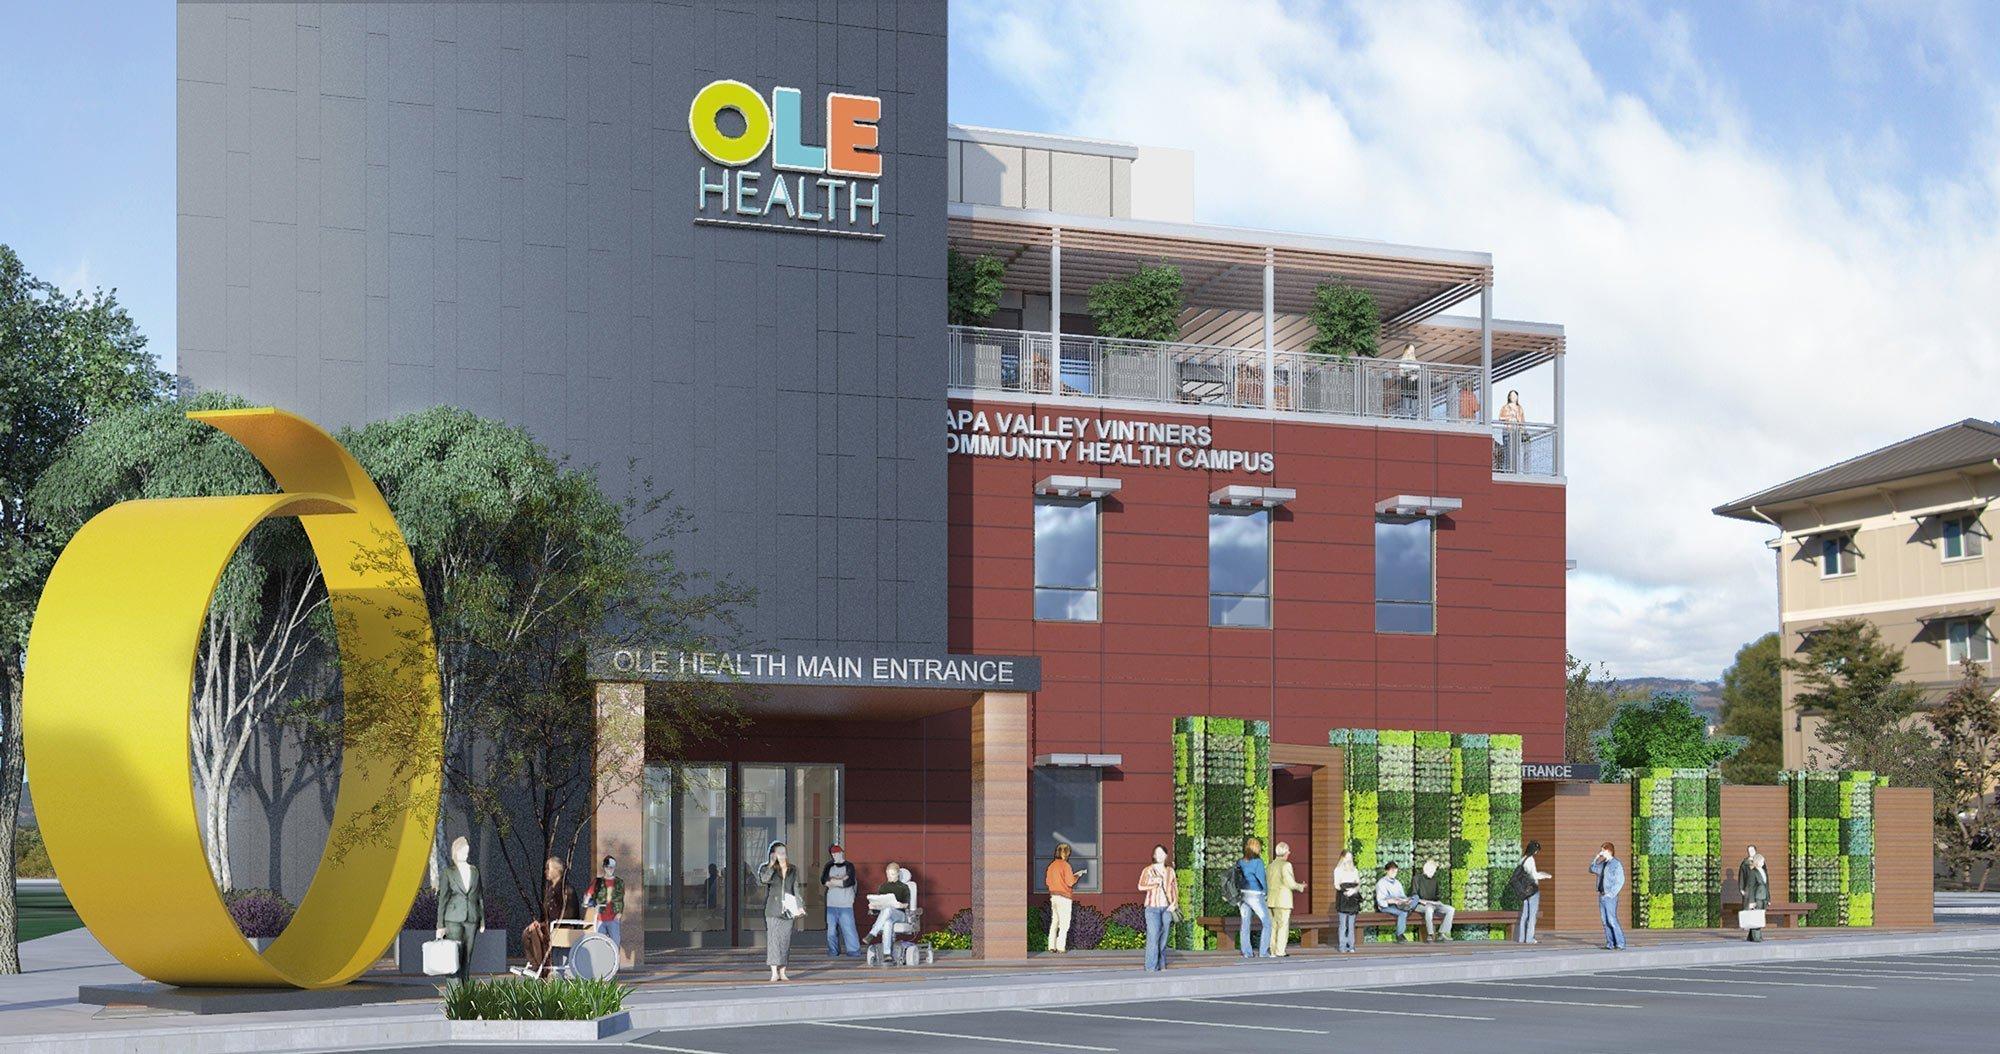 Ole Health Sculpture